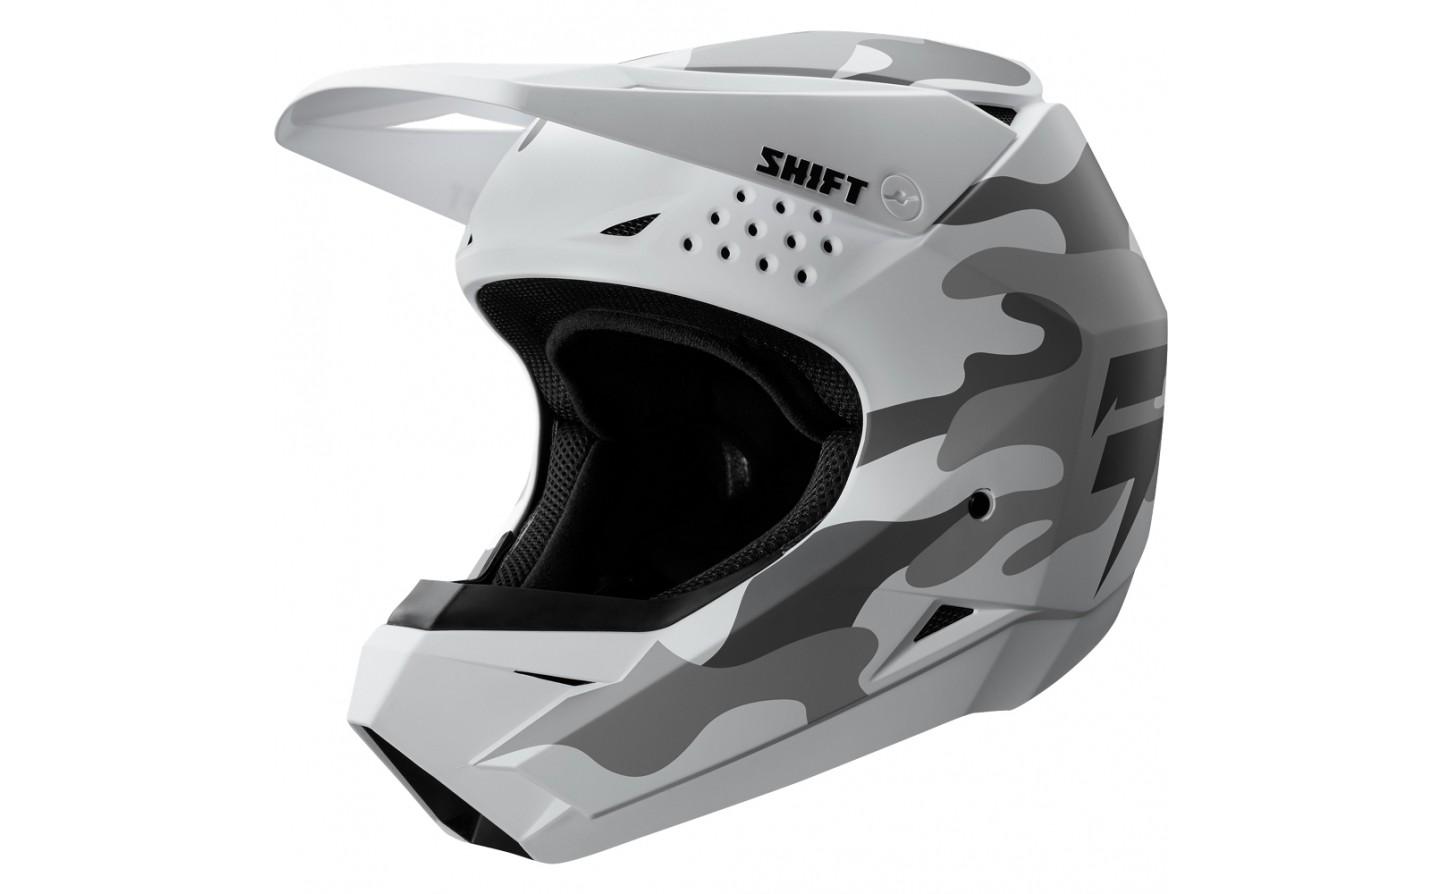 5451cb6b40de4 ... Casco Motocross Shift Whit3 Helmet (Camo) Blanco Camo